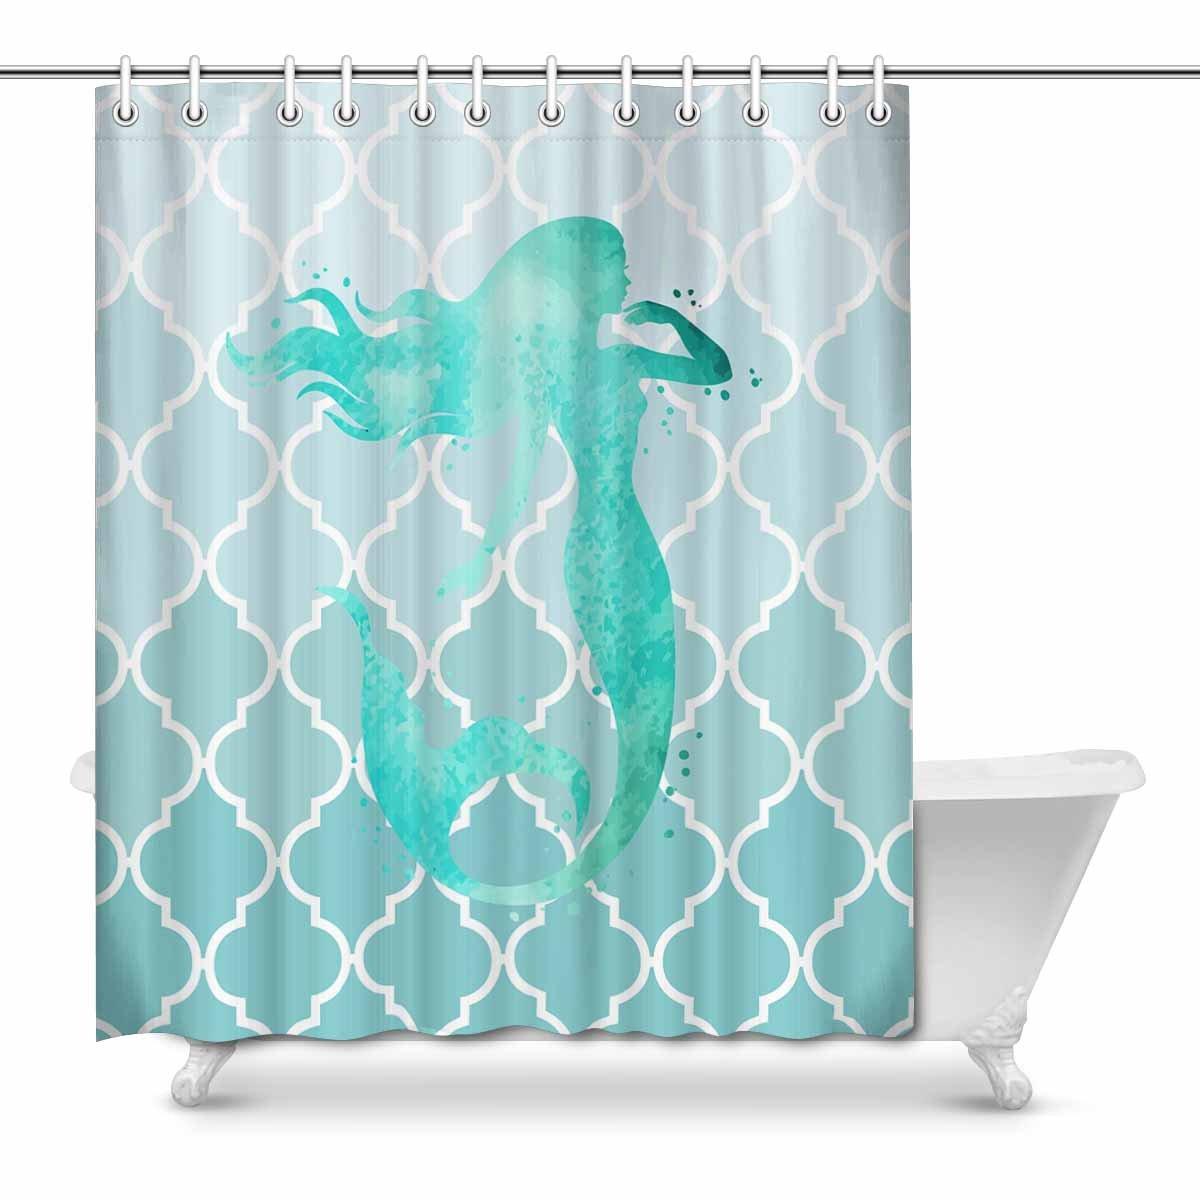 Bridges Pattern Shower Curtain Fabric Decor Set with Hooks 4 Sizes